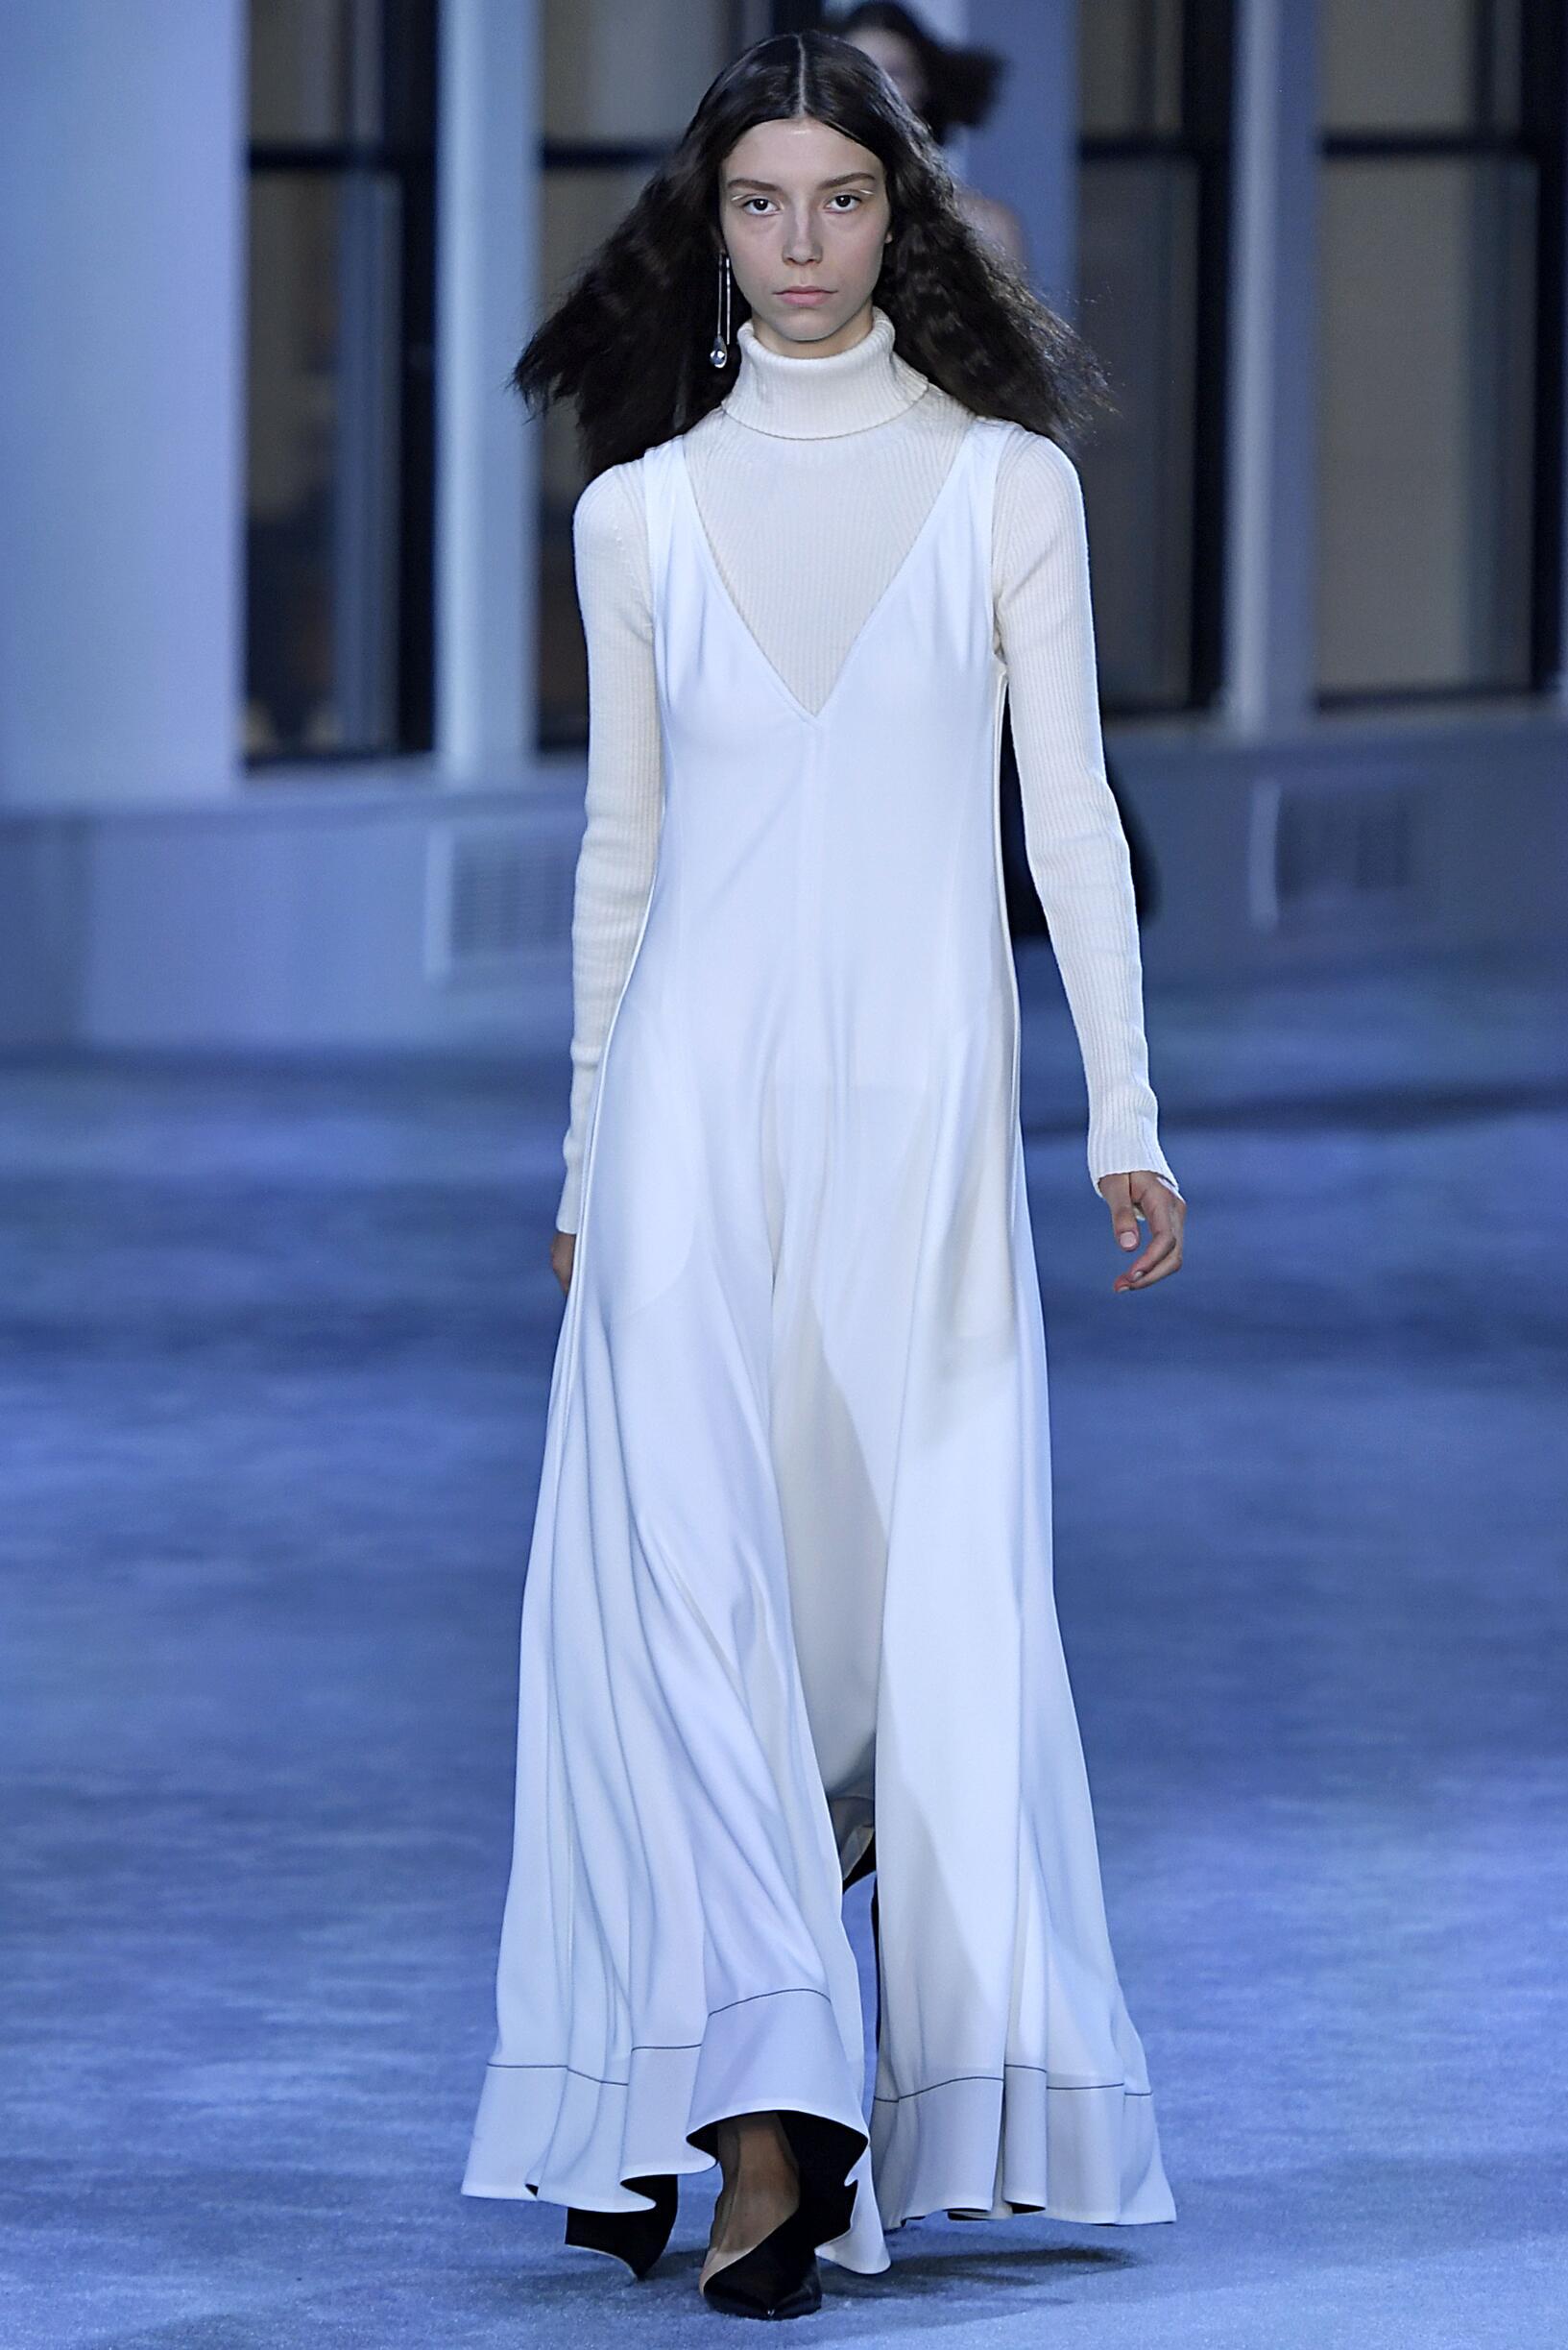 2019 Catwalk 3.1 Phillip Lim Woman Fashion Show Winter